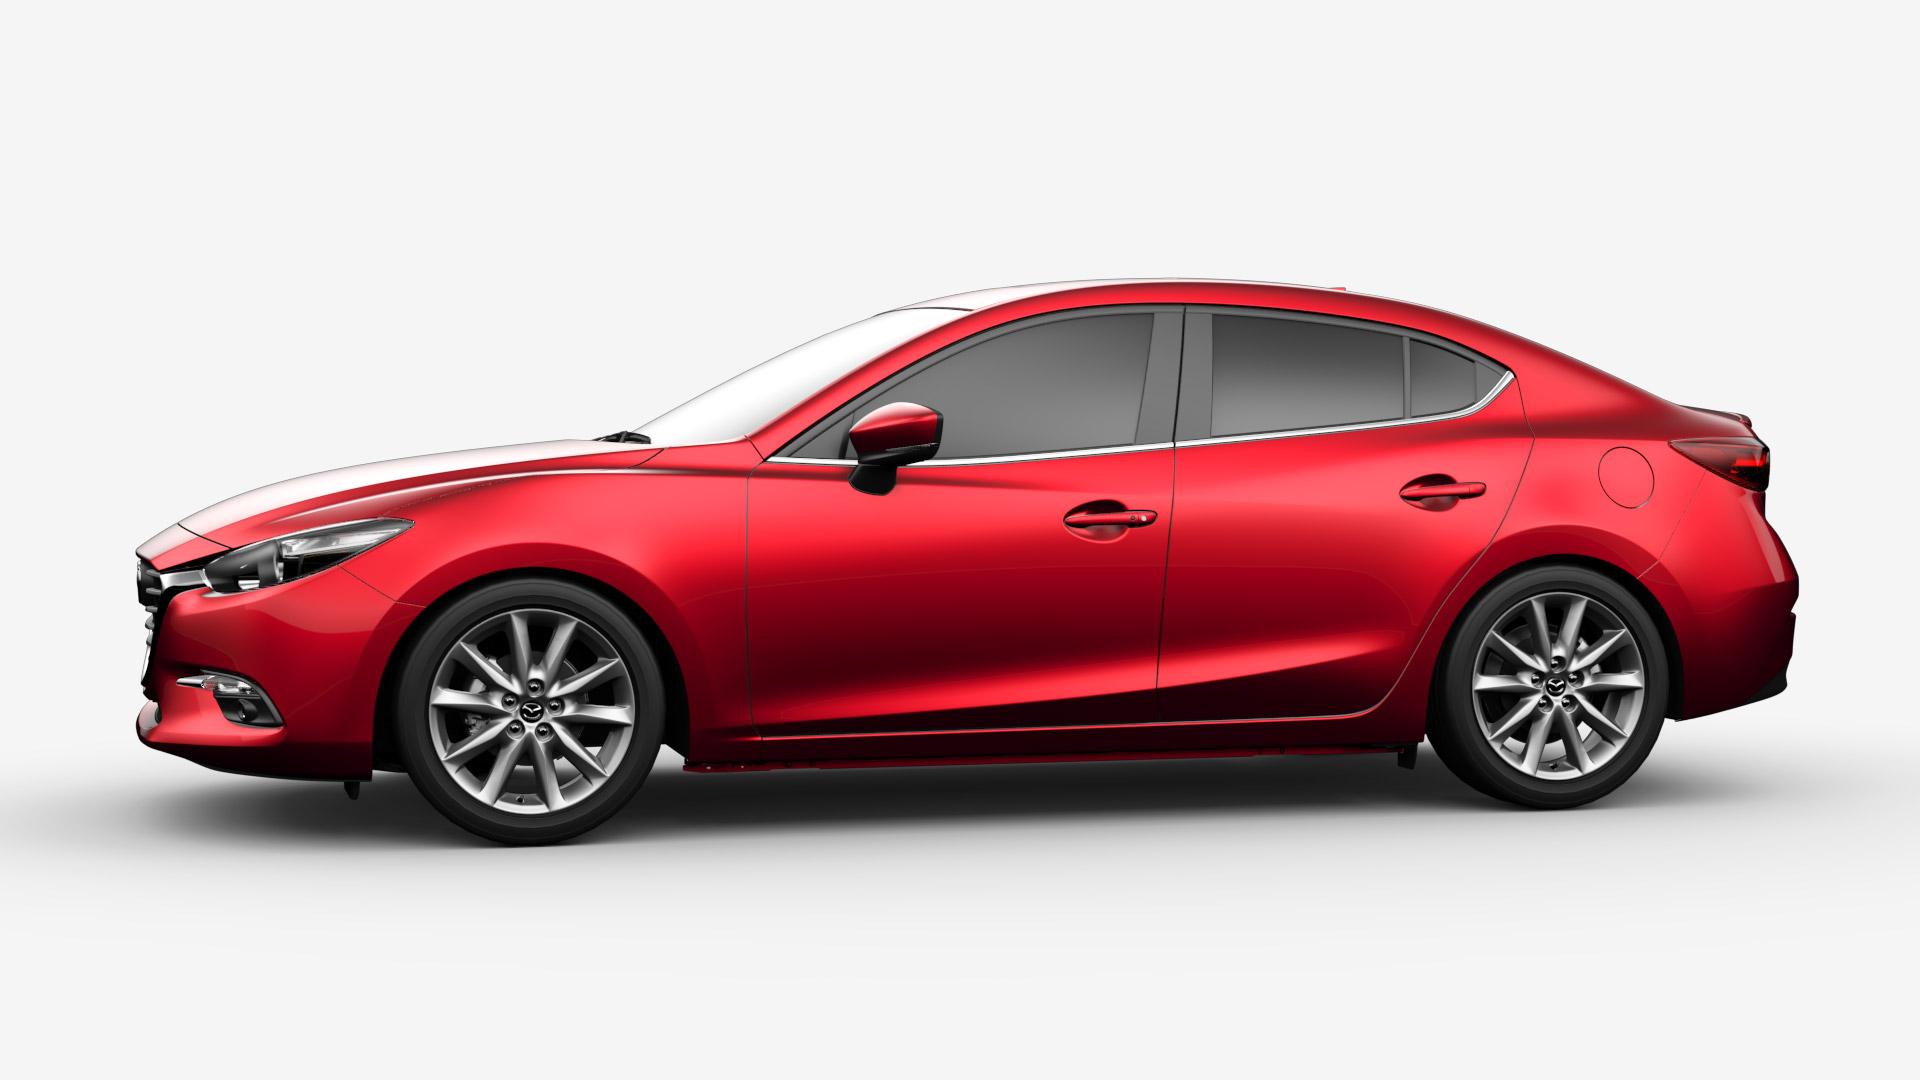 2015 Mazda 3 Sport GS - Price, engine, full technical ...